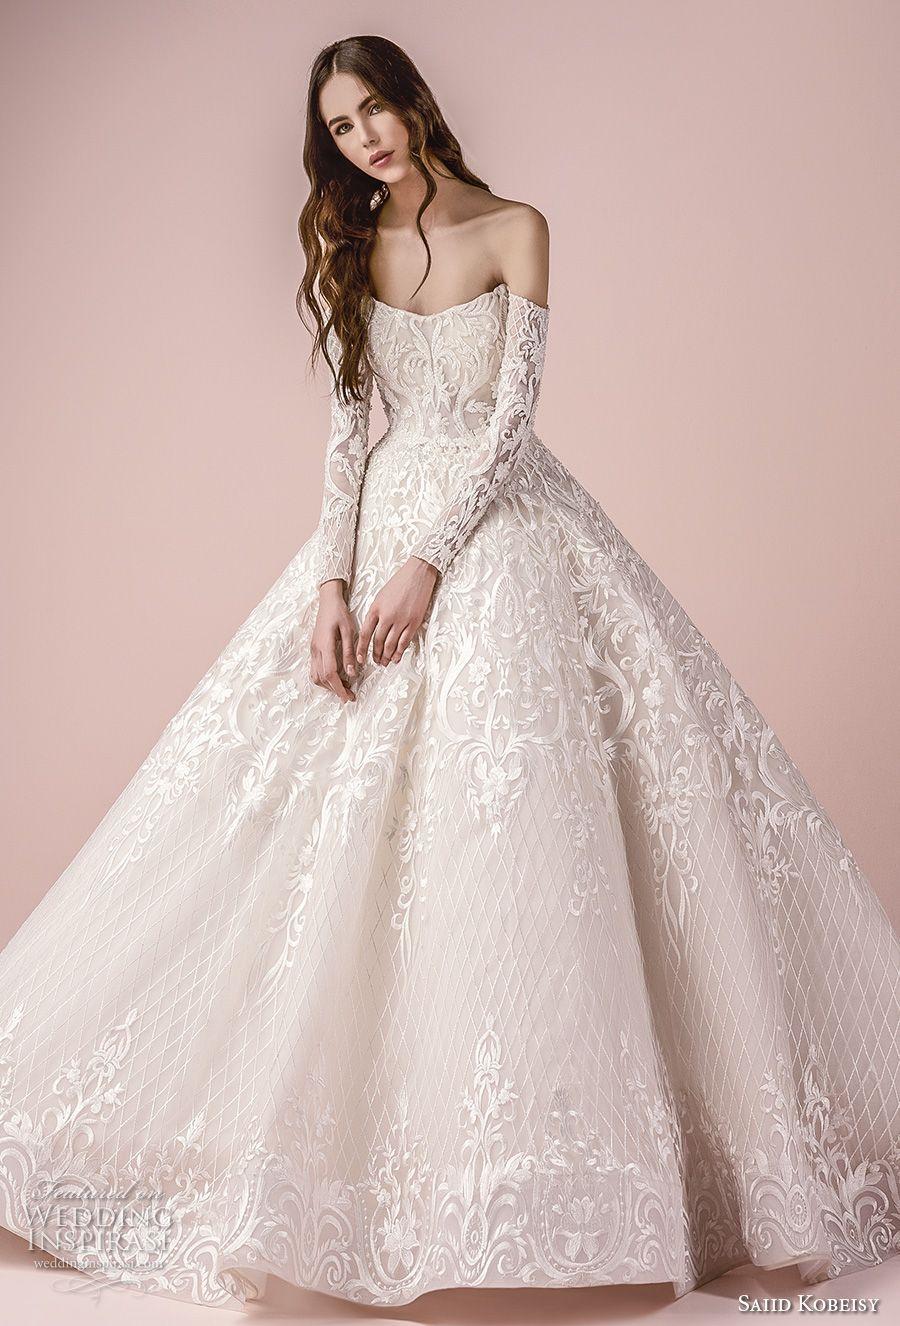 Saiid kobeisy 2018 wedding dresses ball gowns bodice for Princess ball gowns wedding dresses